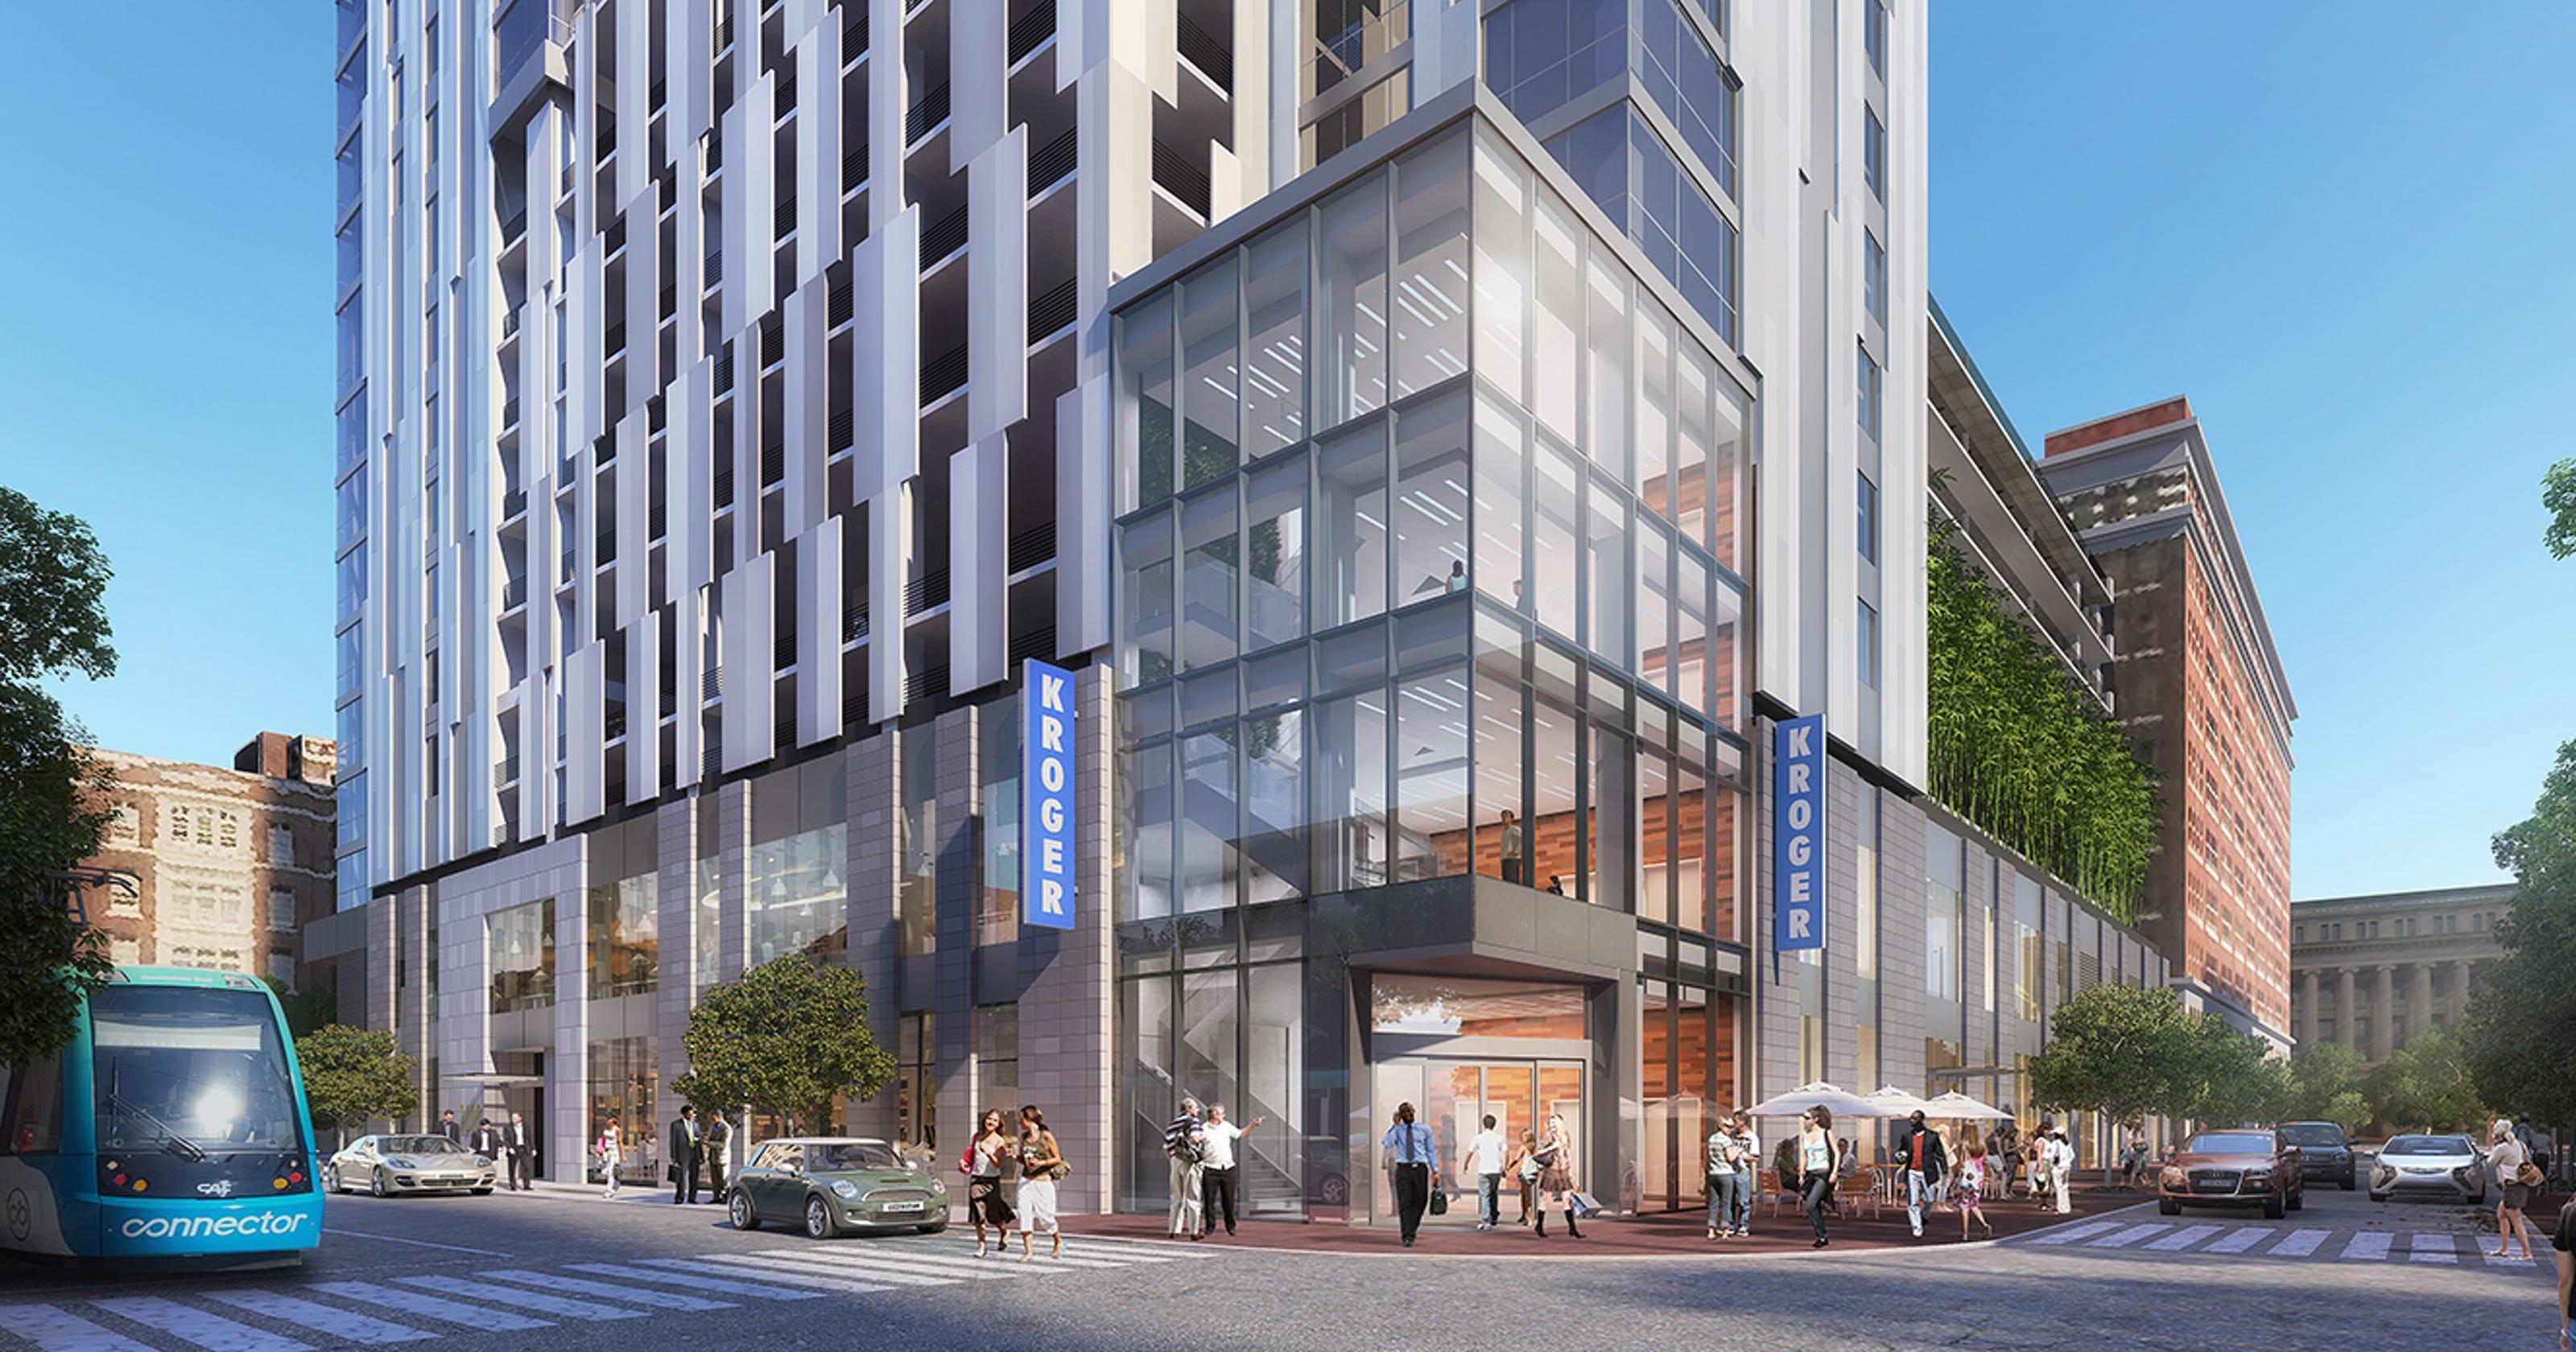 Kroger to build its first Downtown Cincinnati supermarket